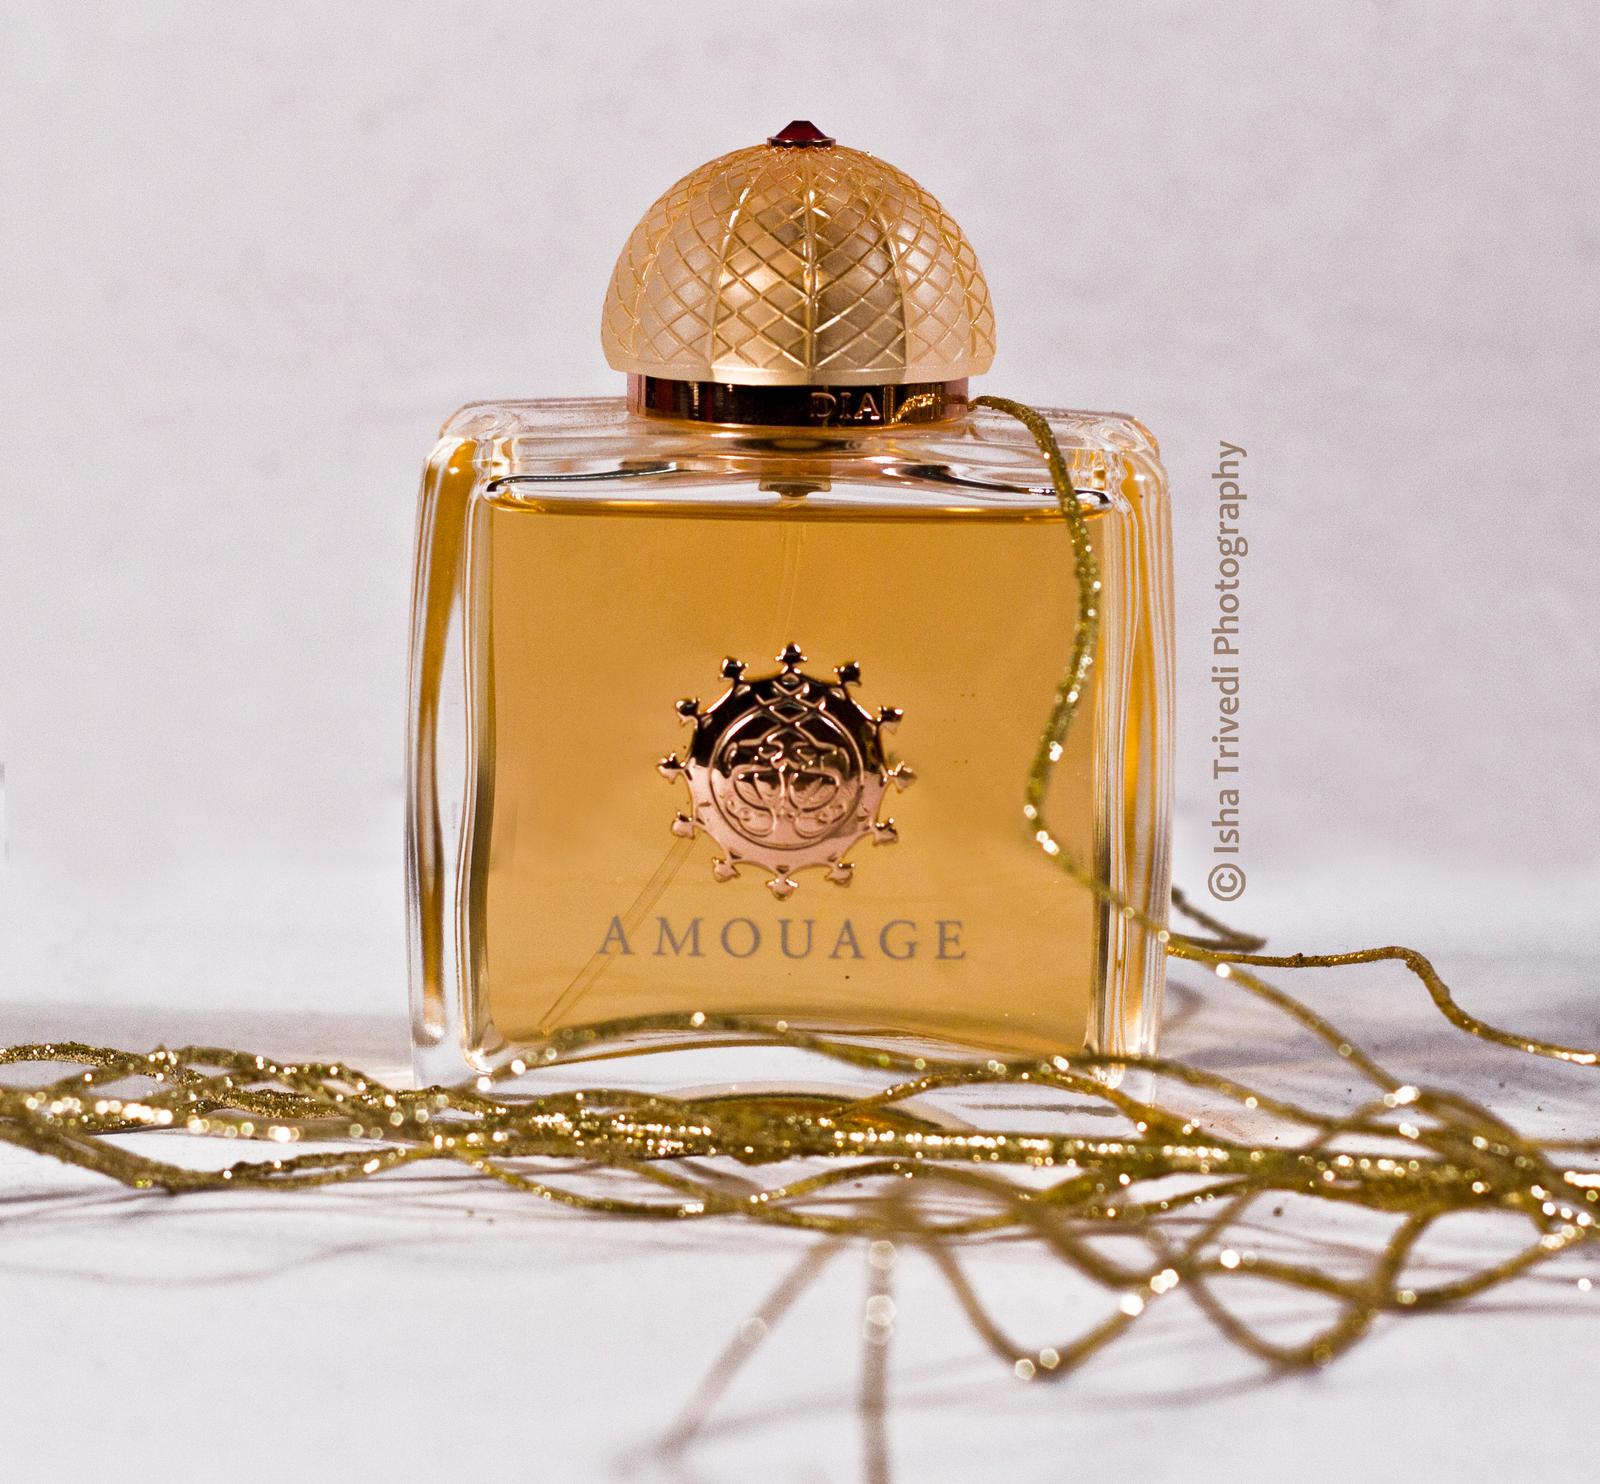 AMOUAGE - Isha Trivedi Photography by trivediisha